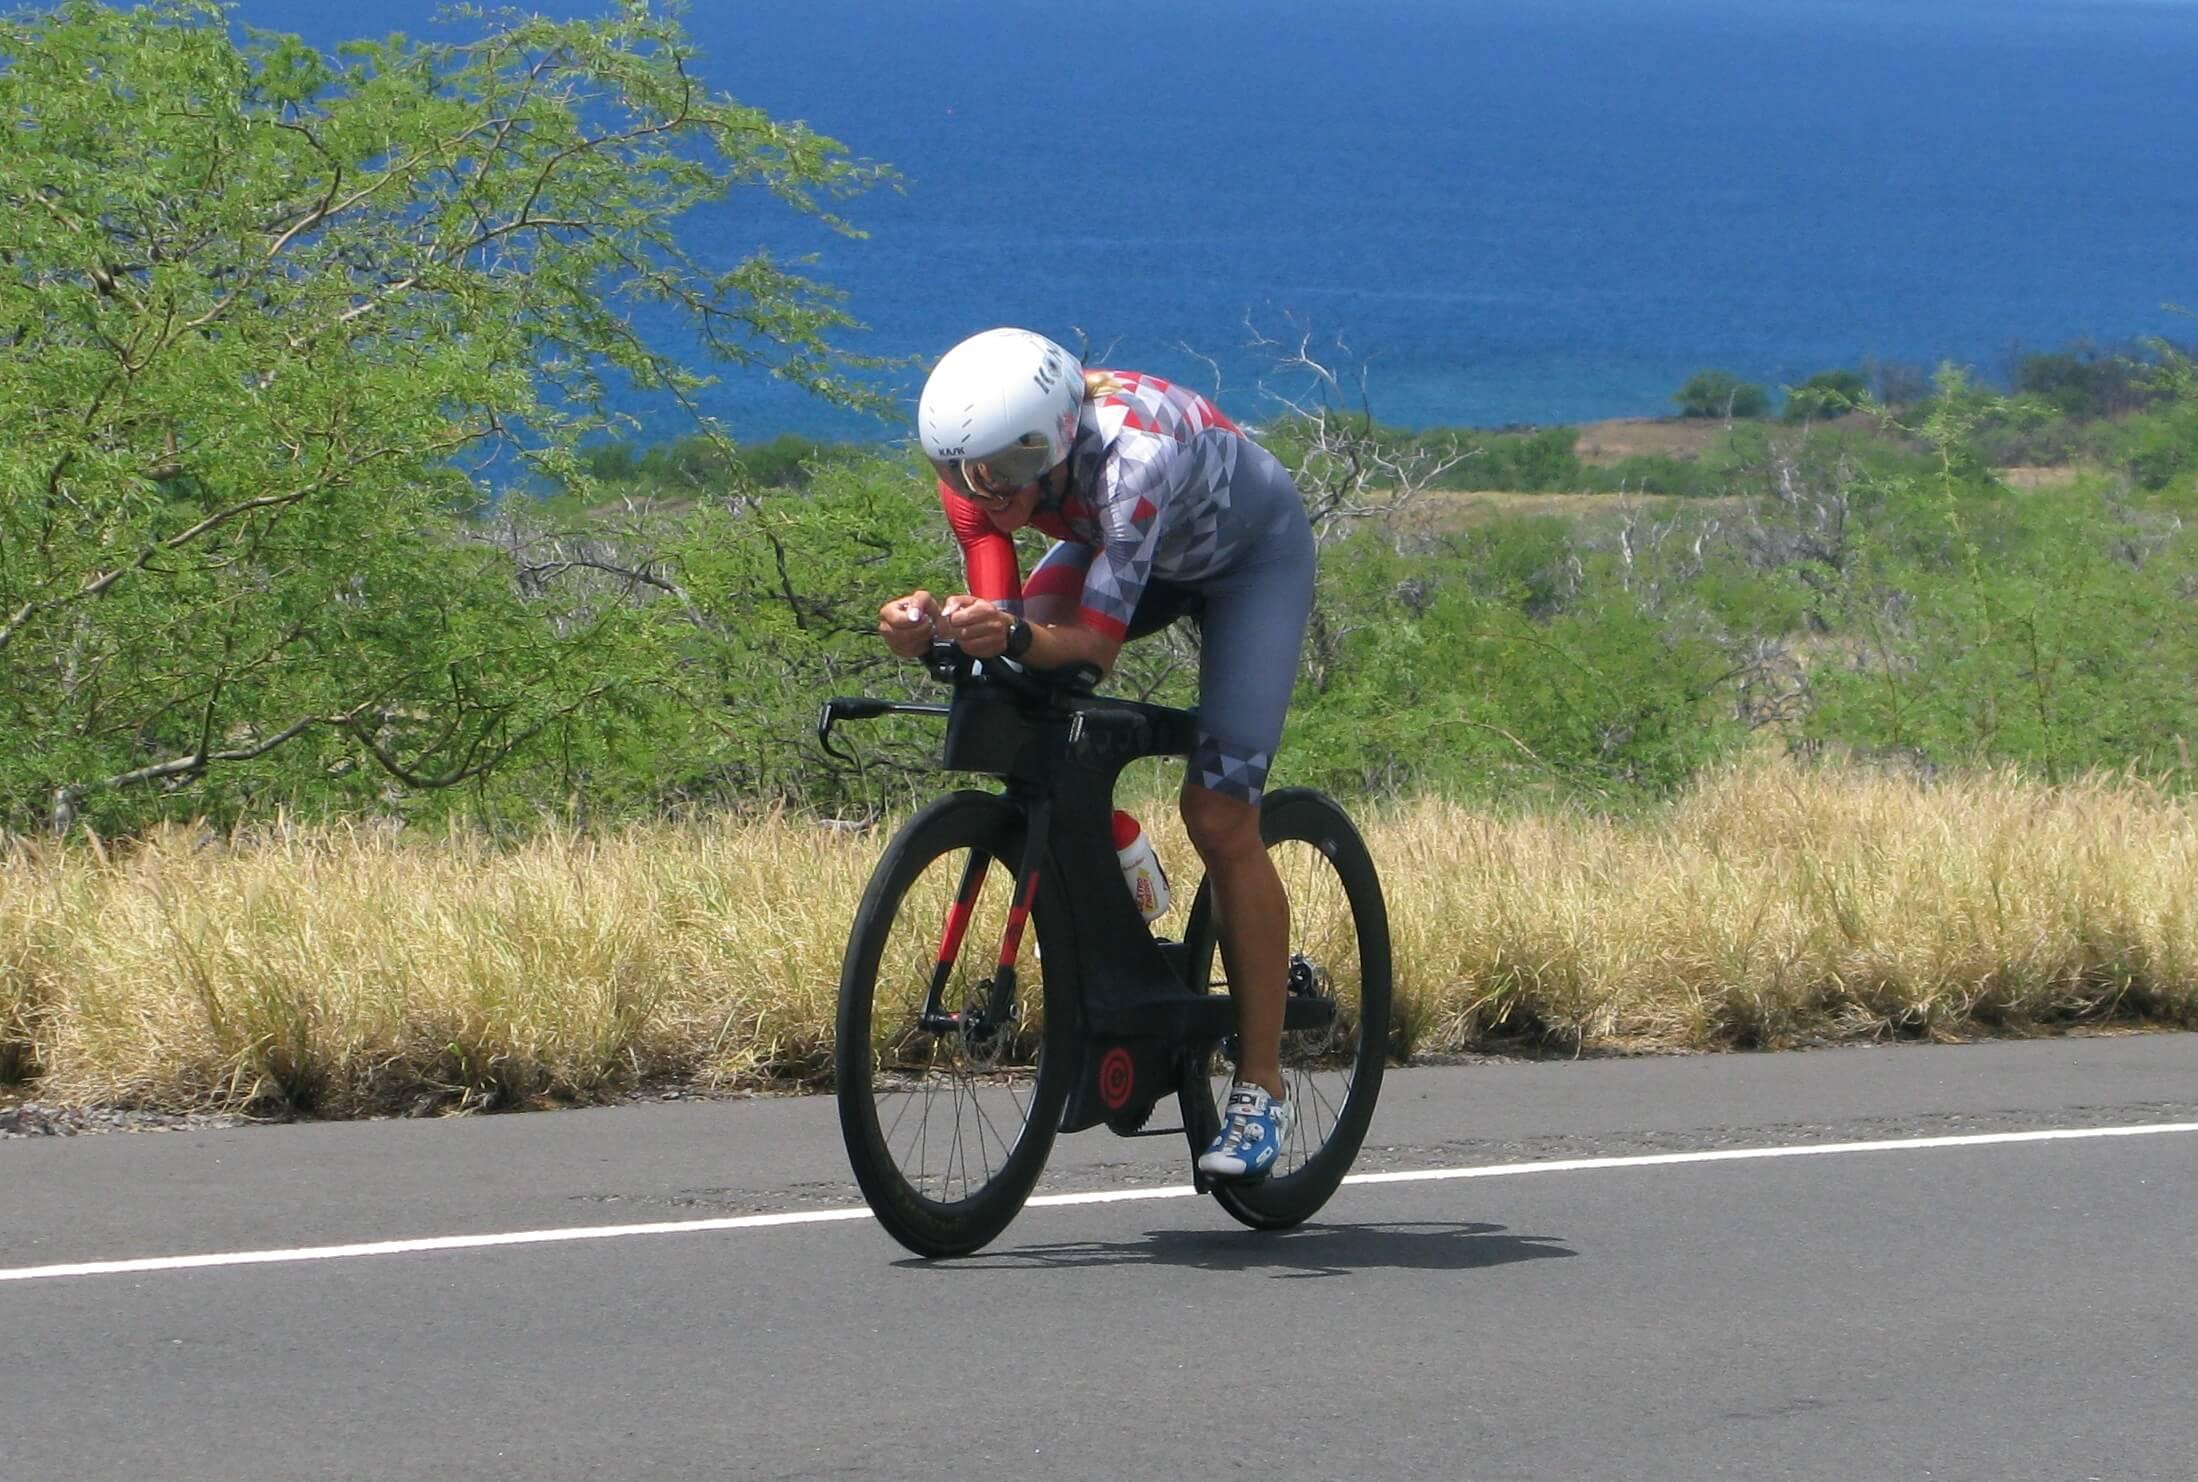 IRONMAN-Hawaii-MAreen-Hufe-Bike